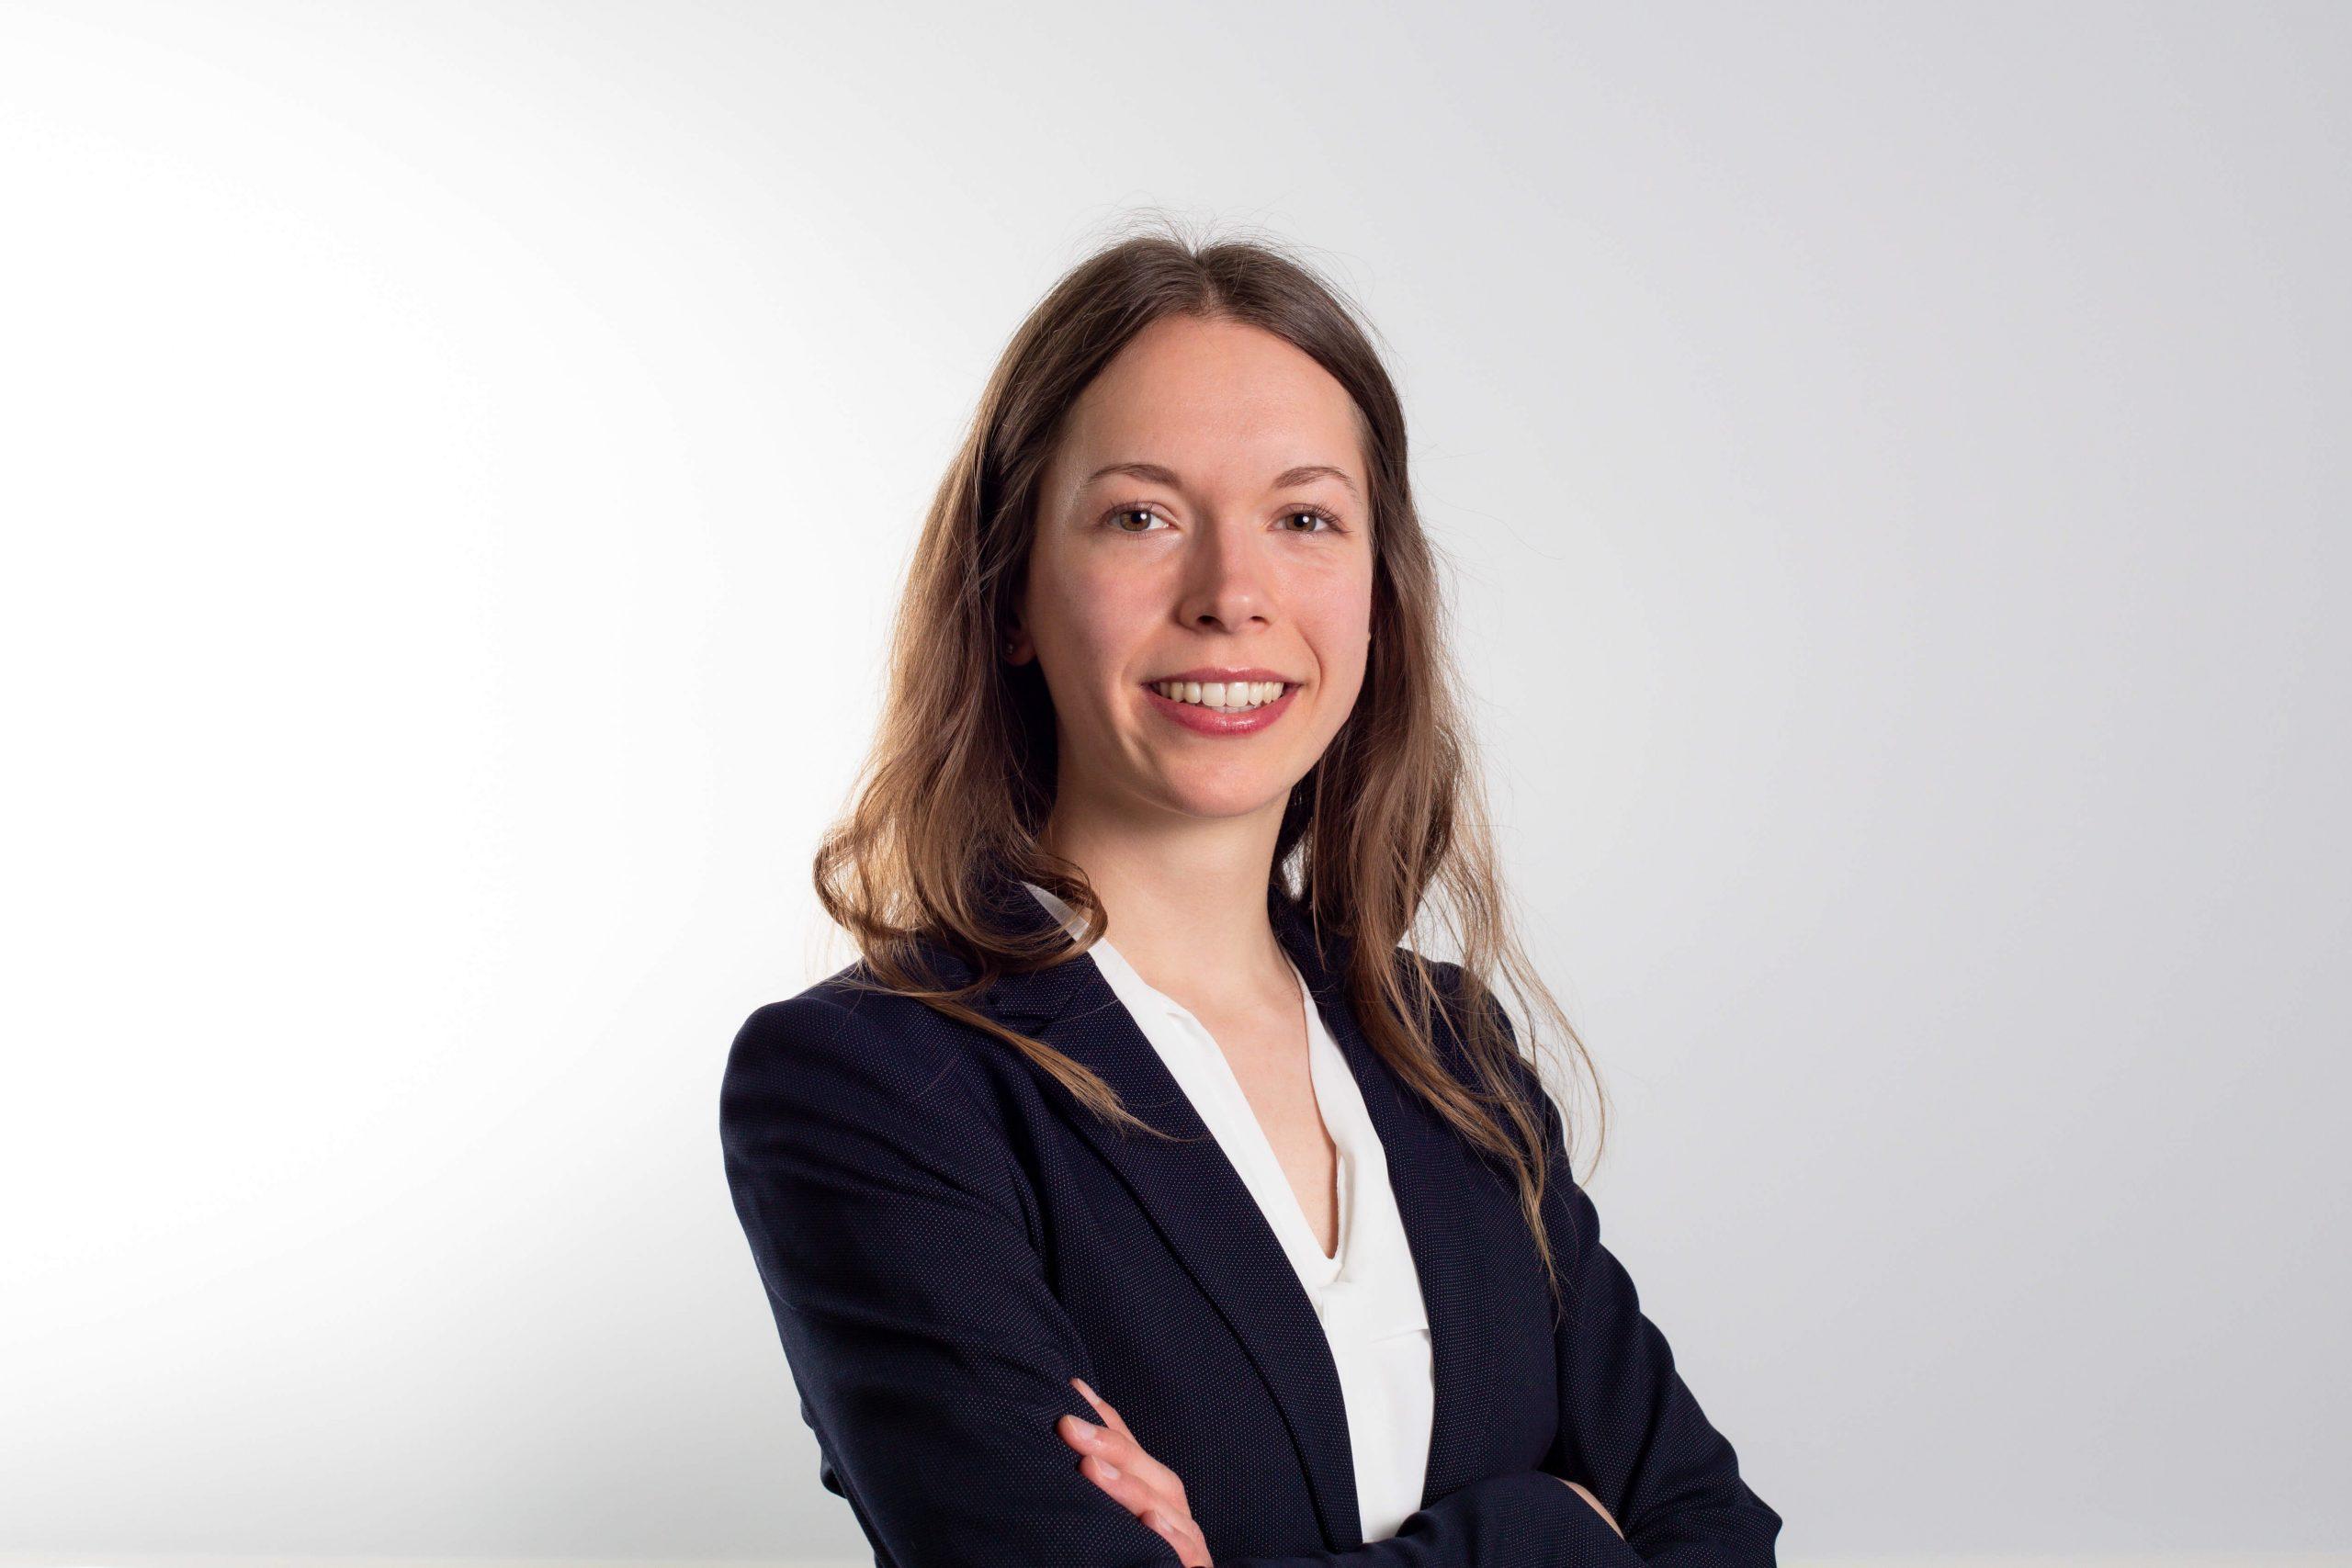 Johanna Kleemair